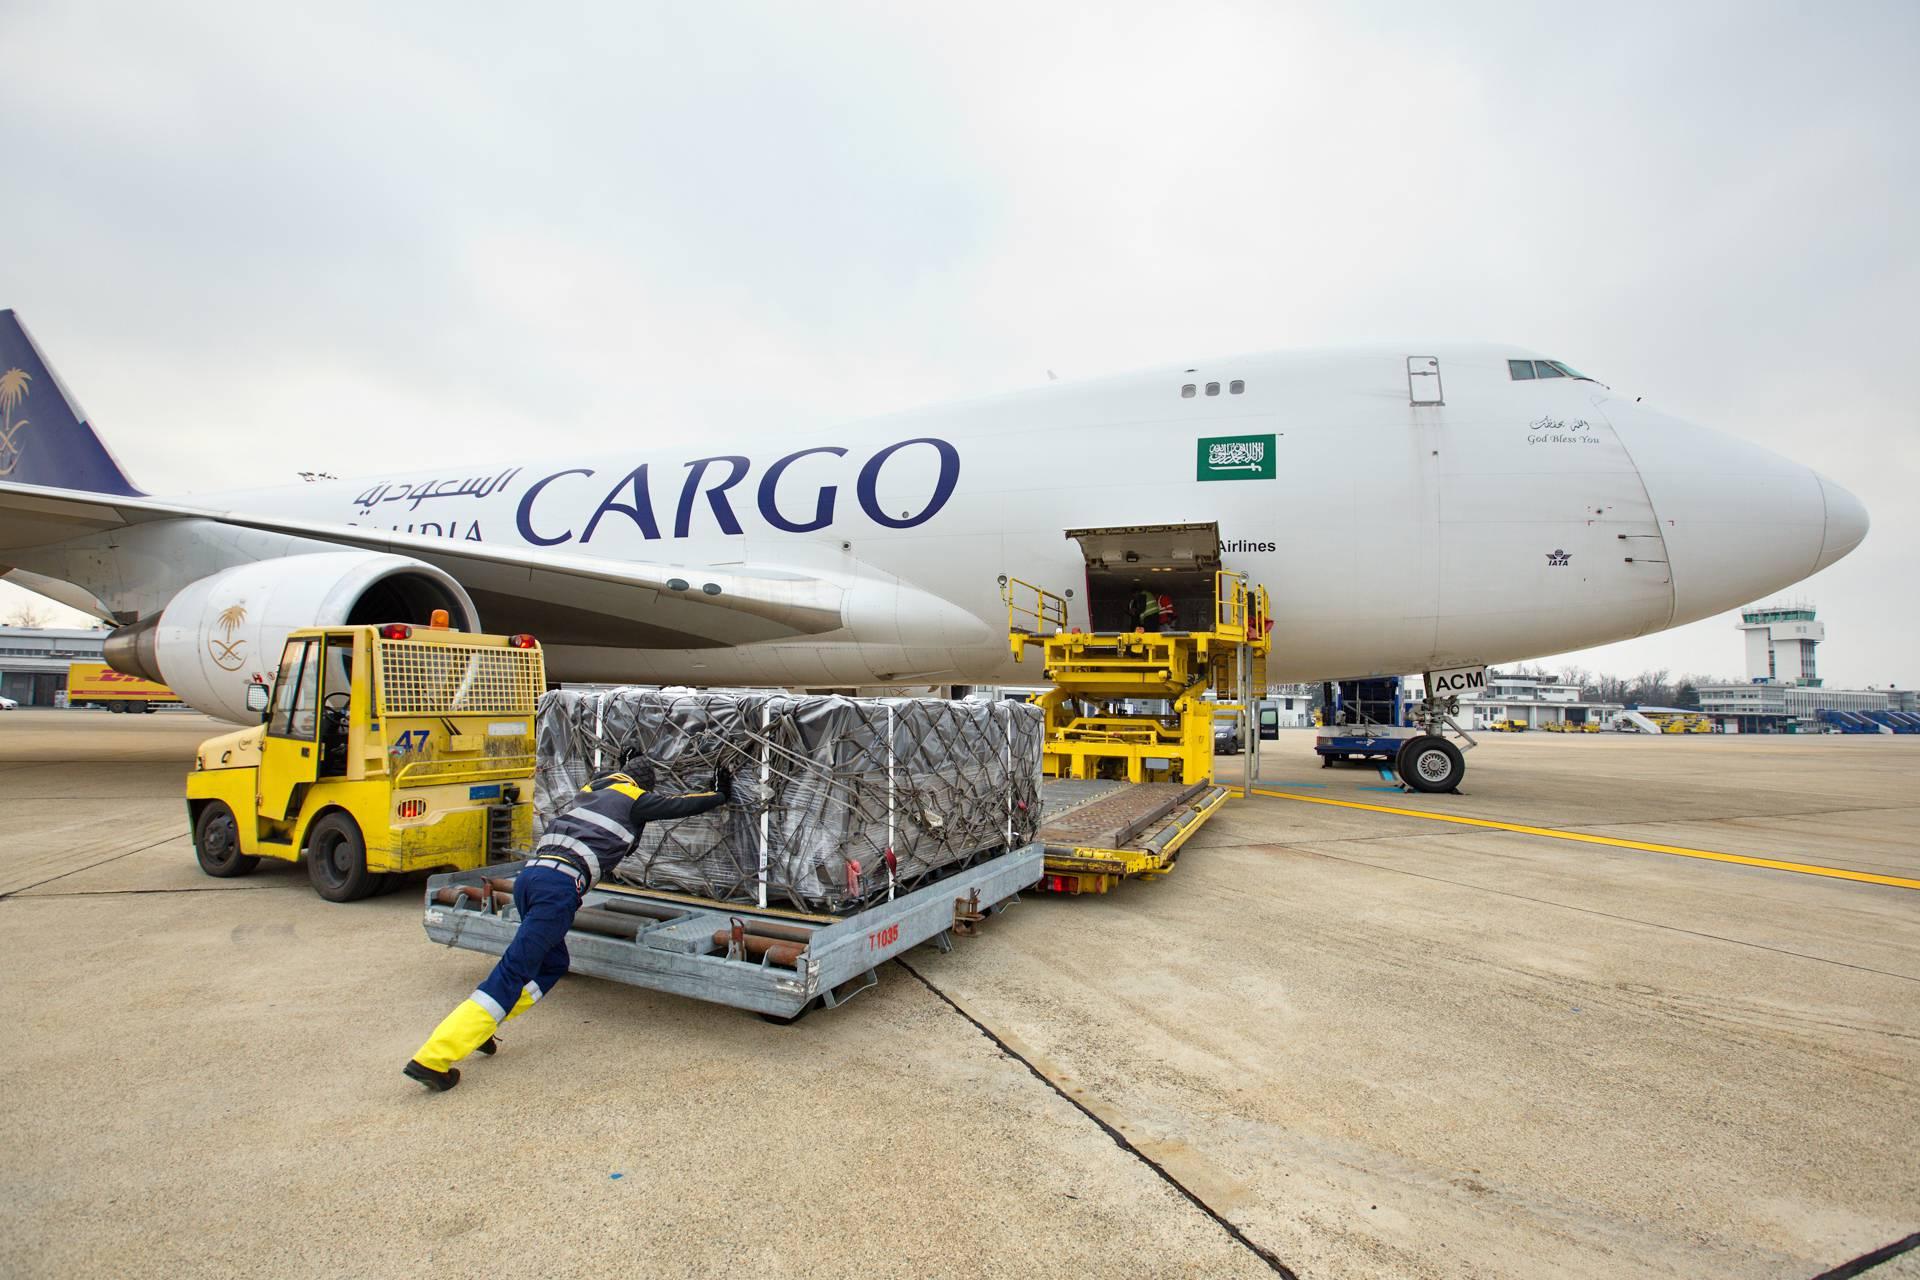 Najveca Cargo Operacija U Zracnoj Luci Franjo Tuđman 24sata